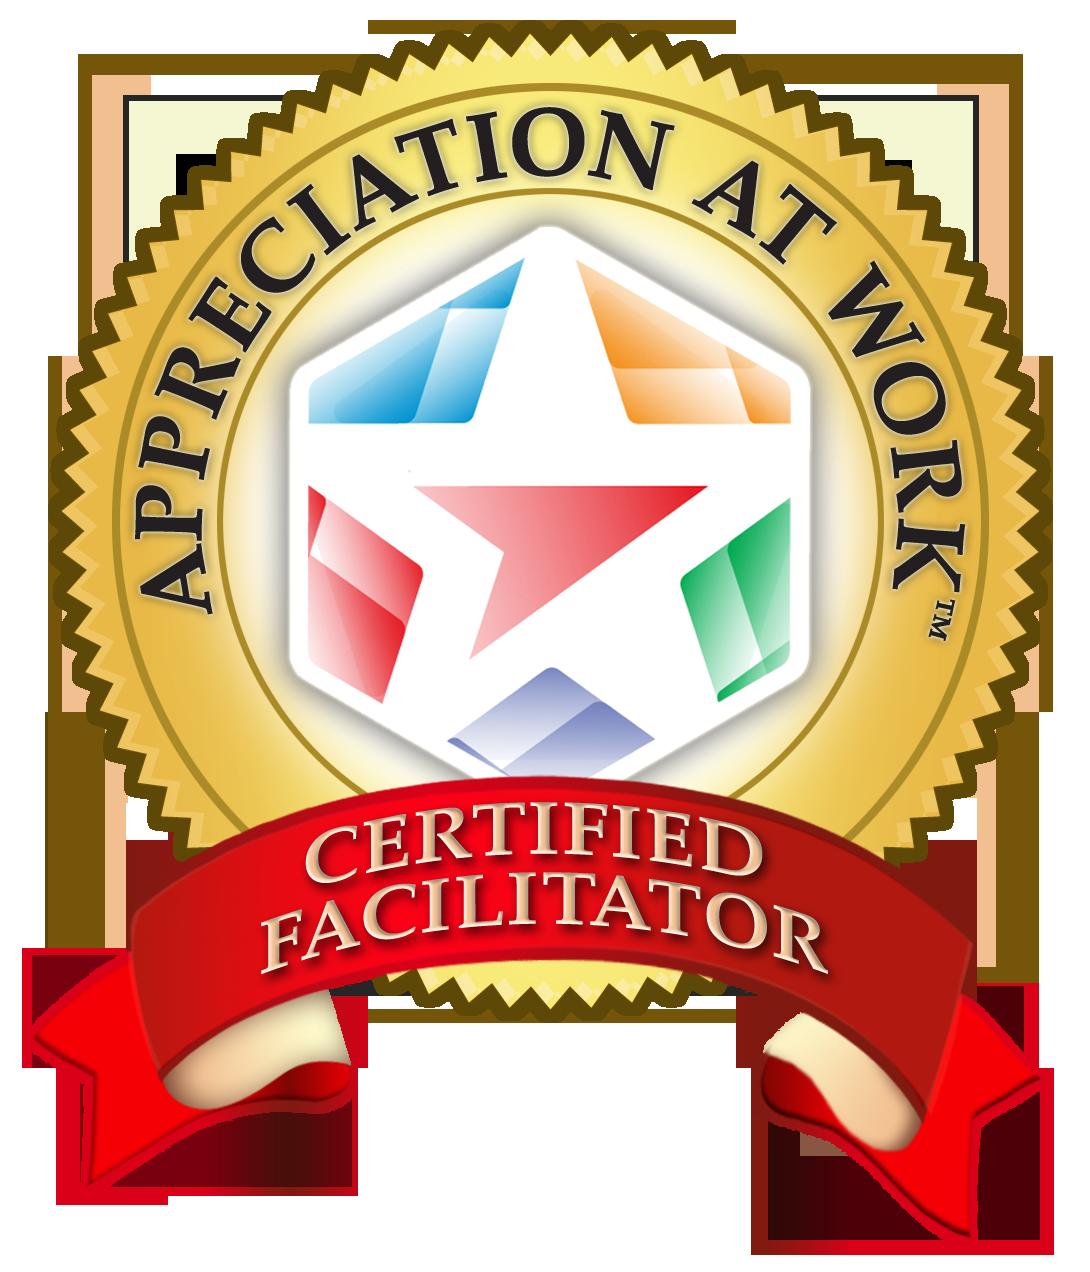 Trust clipart facilitation. Employee engagement strategies how